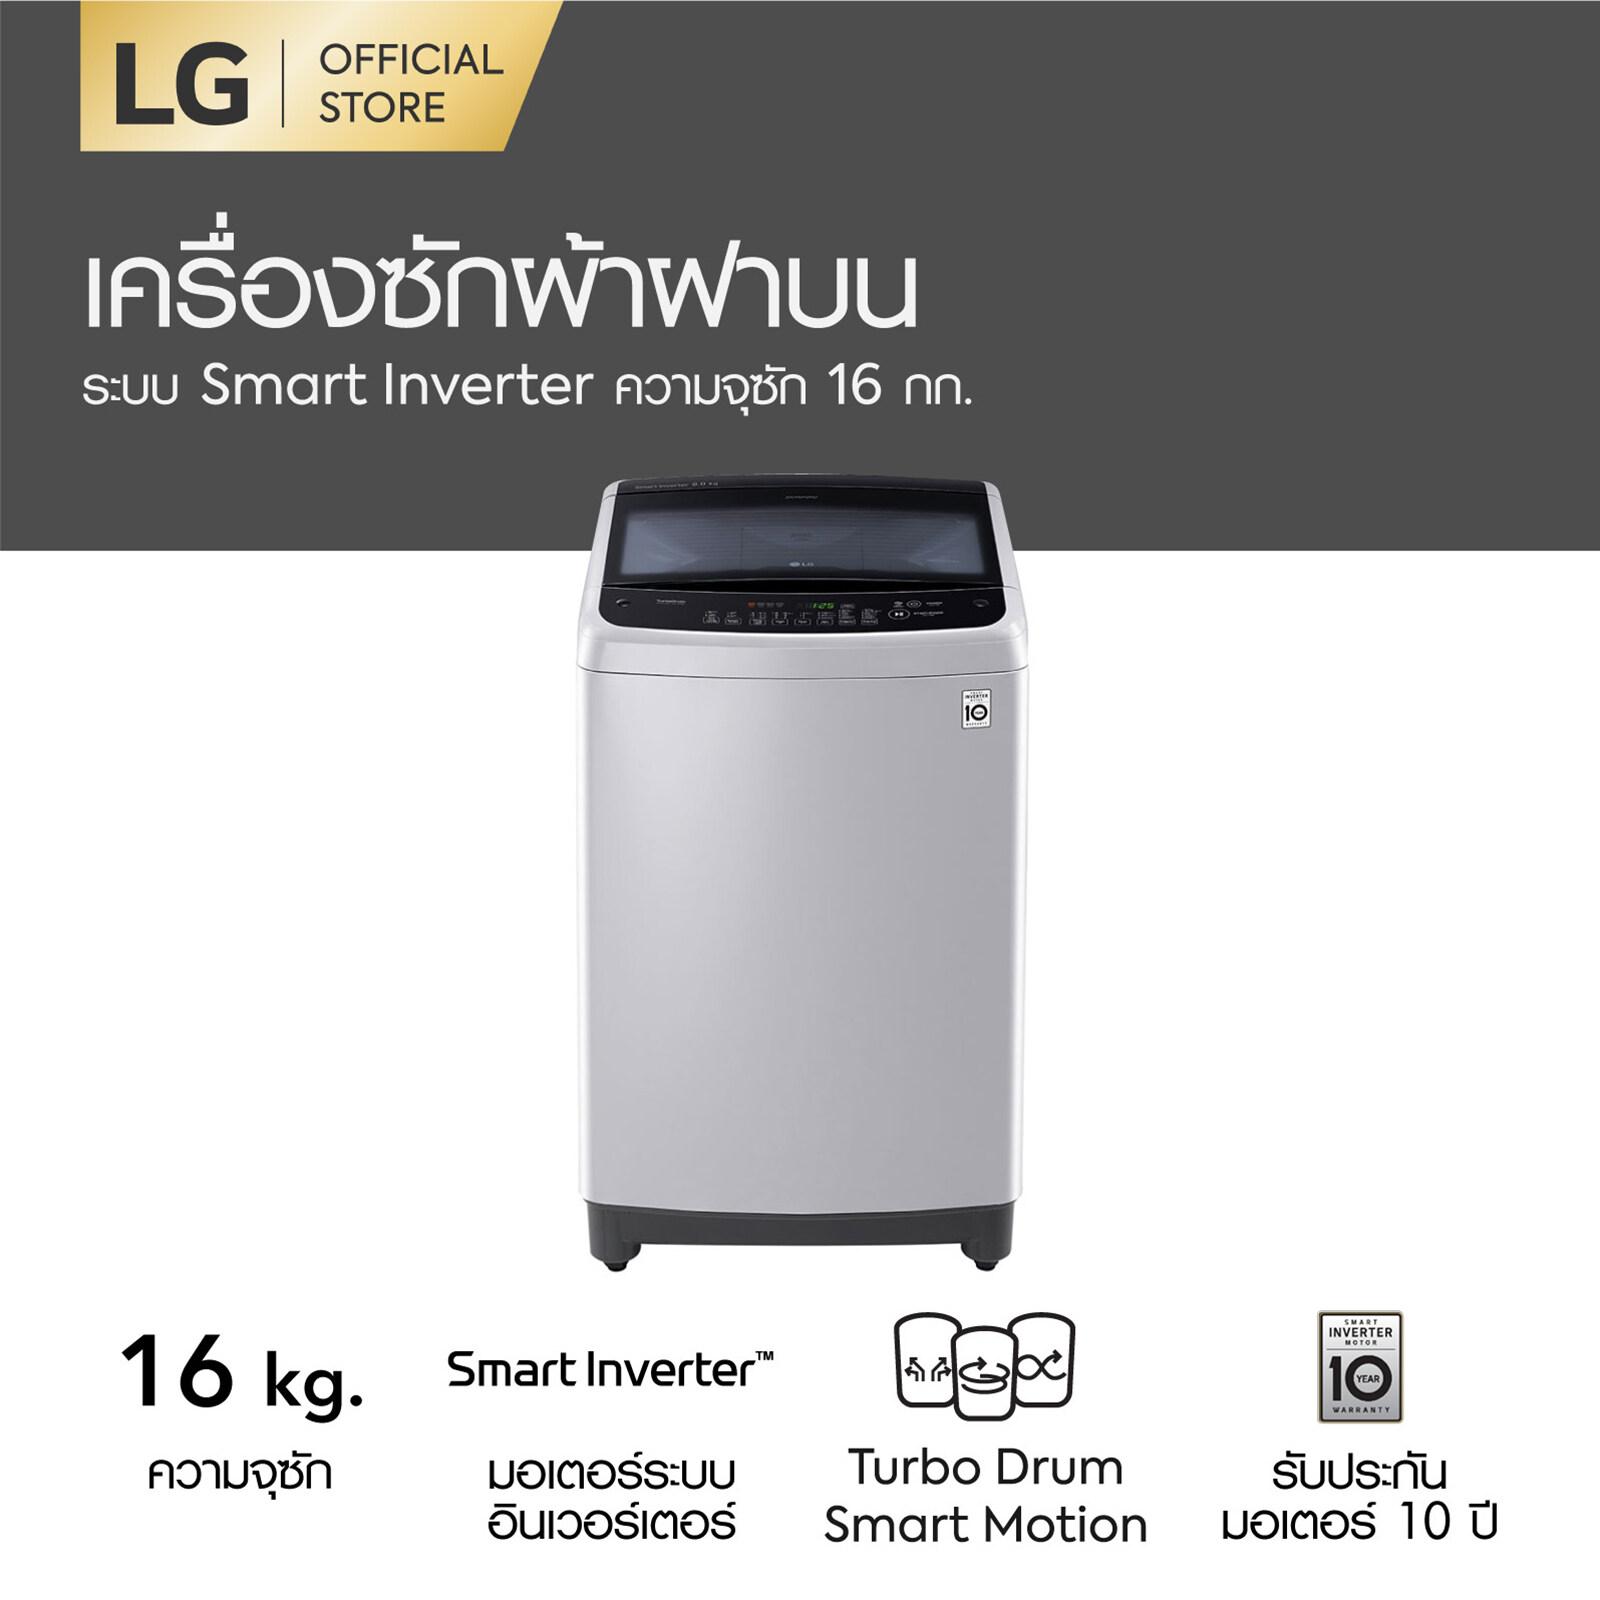 LG เครื่องซักผ้าฝาบนระบบ Smart Inverter ความจุ 16 กก.รุ่น T2516VS2M